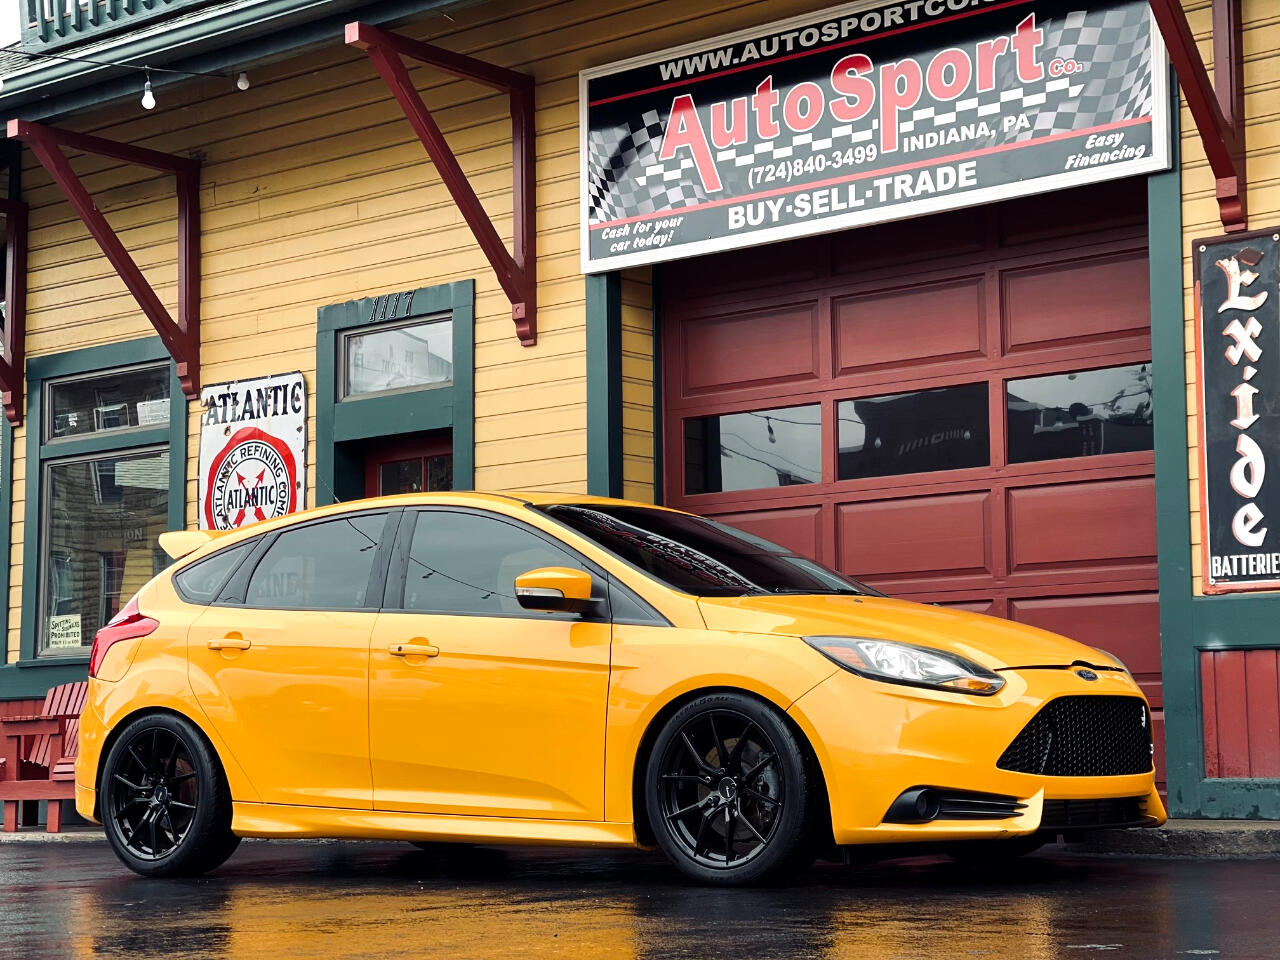 Ford Focus ST Hatch 2014